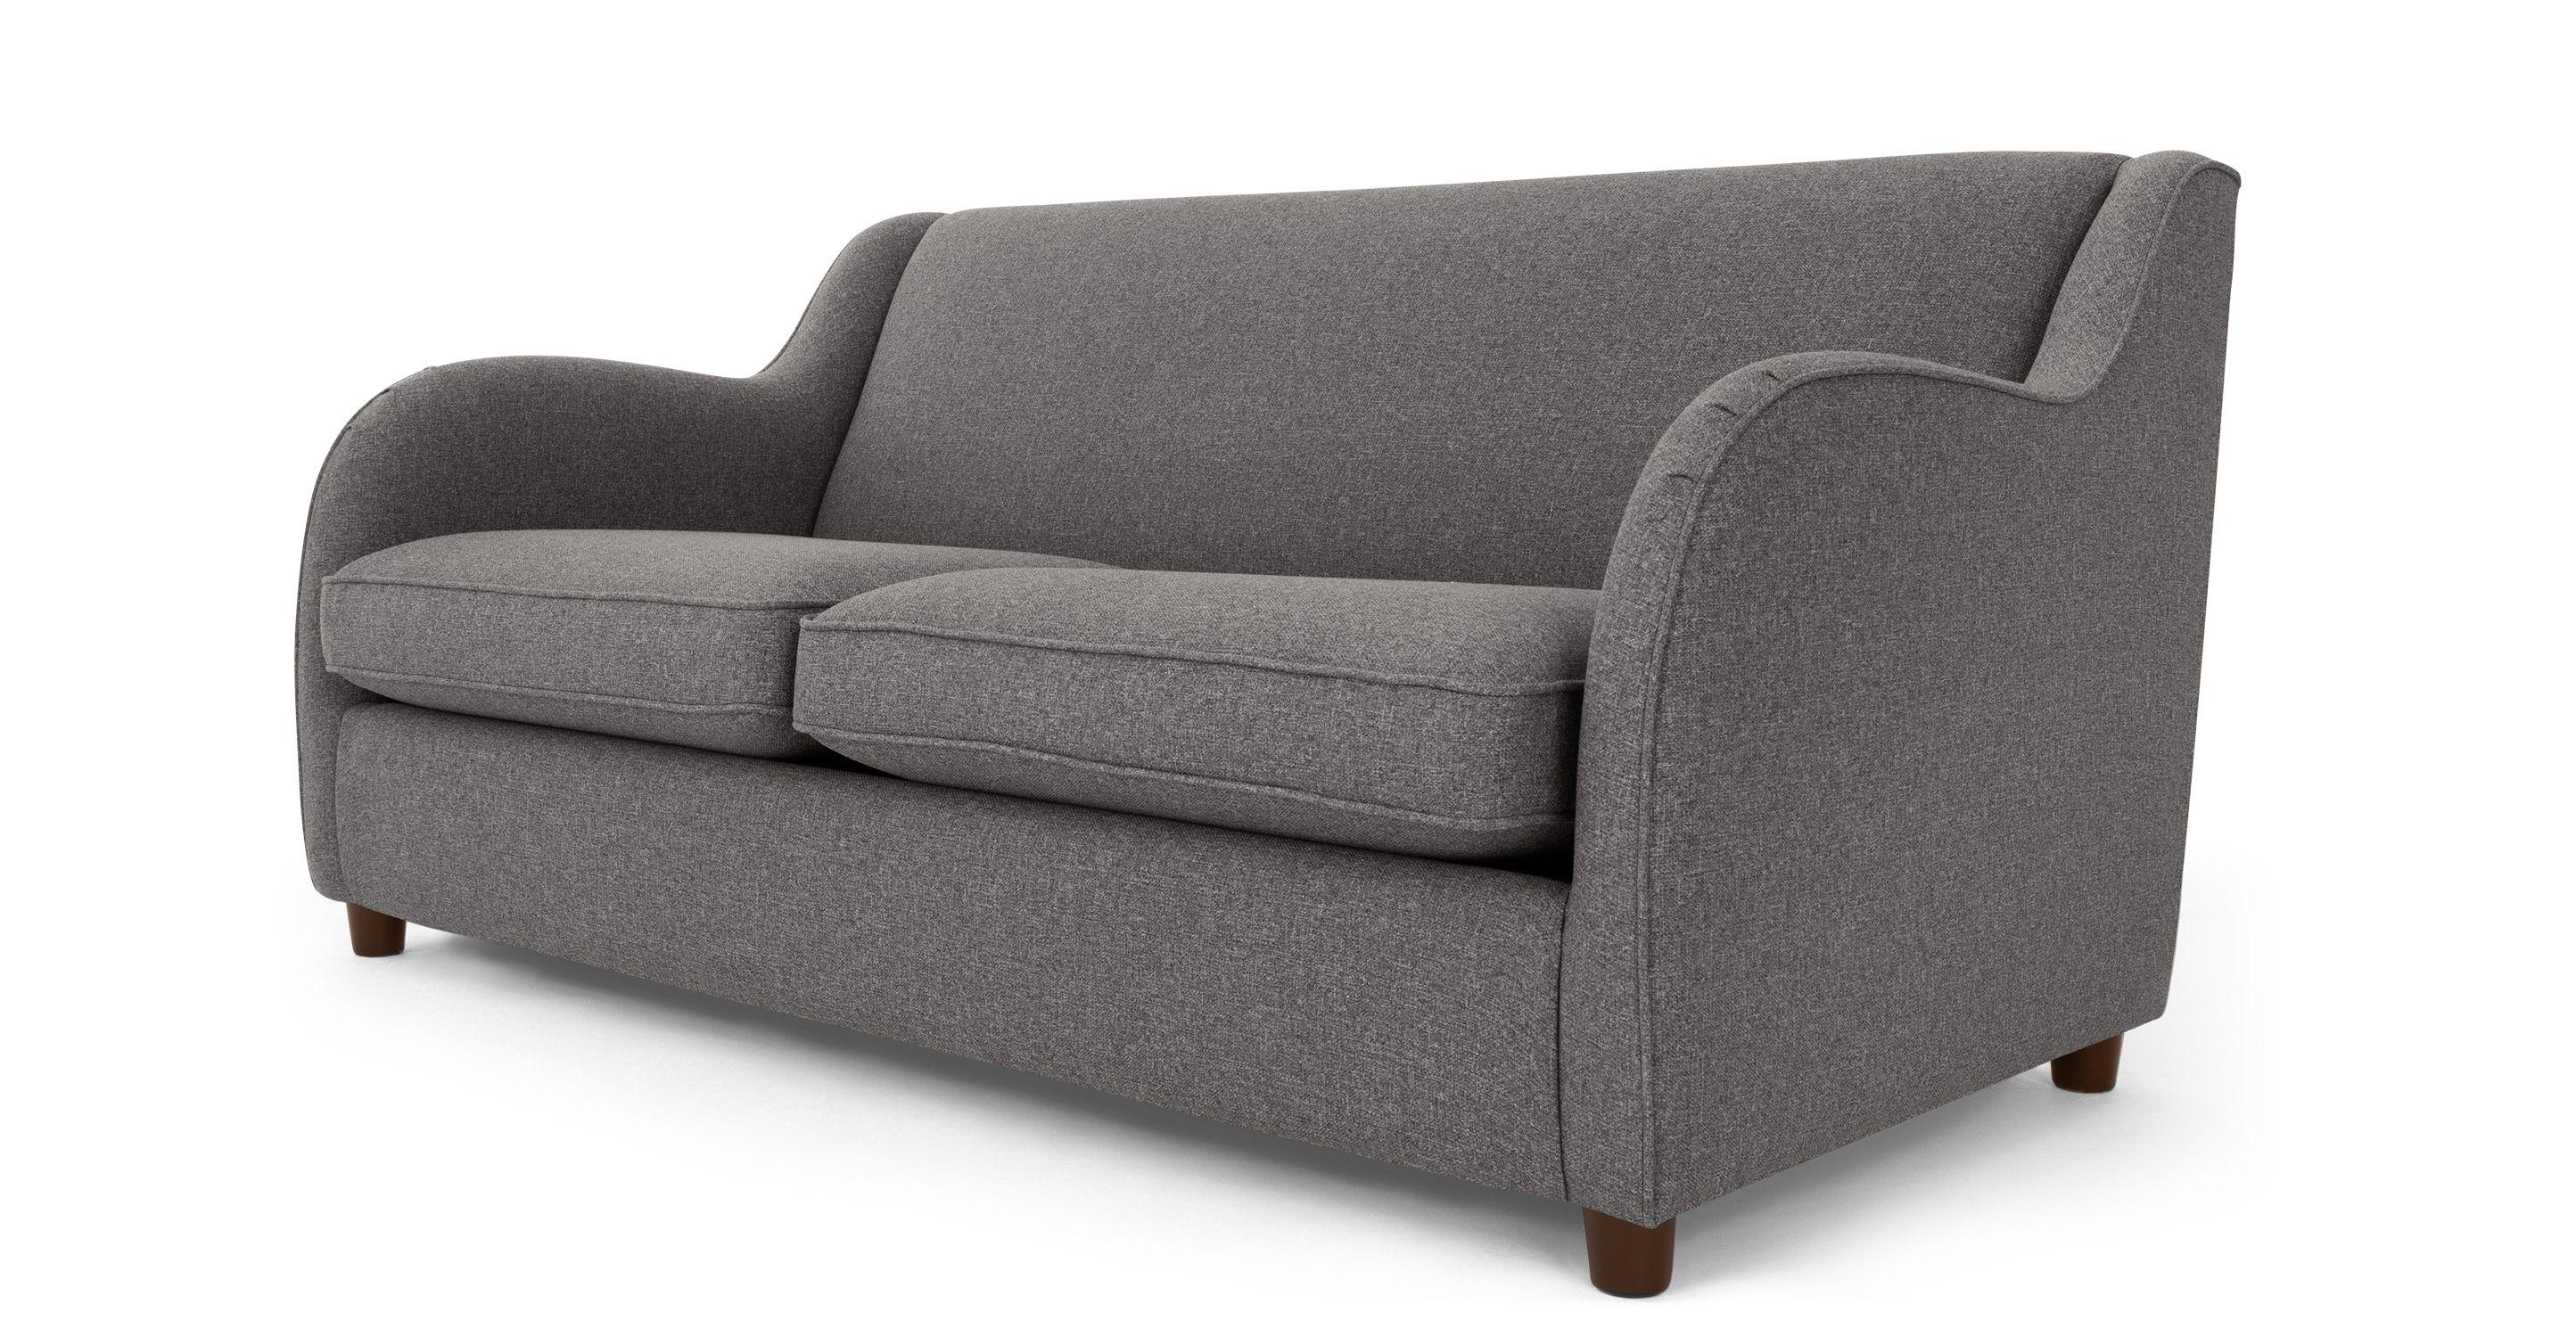 Helena Sofabed Textured Weave Smoke Grey Stylish Sofa Sofa Bed Smoke Grey